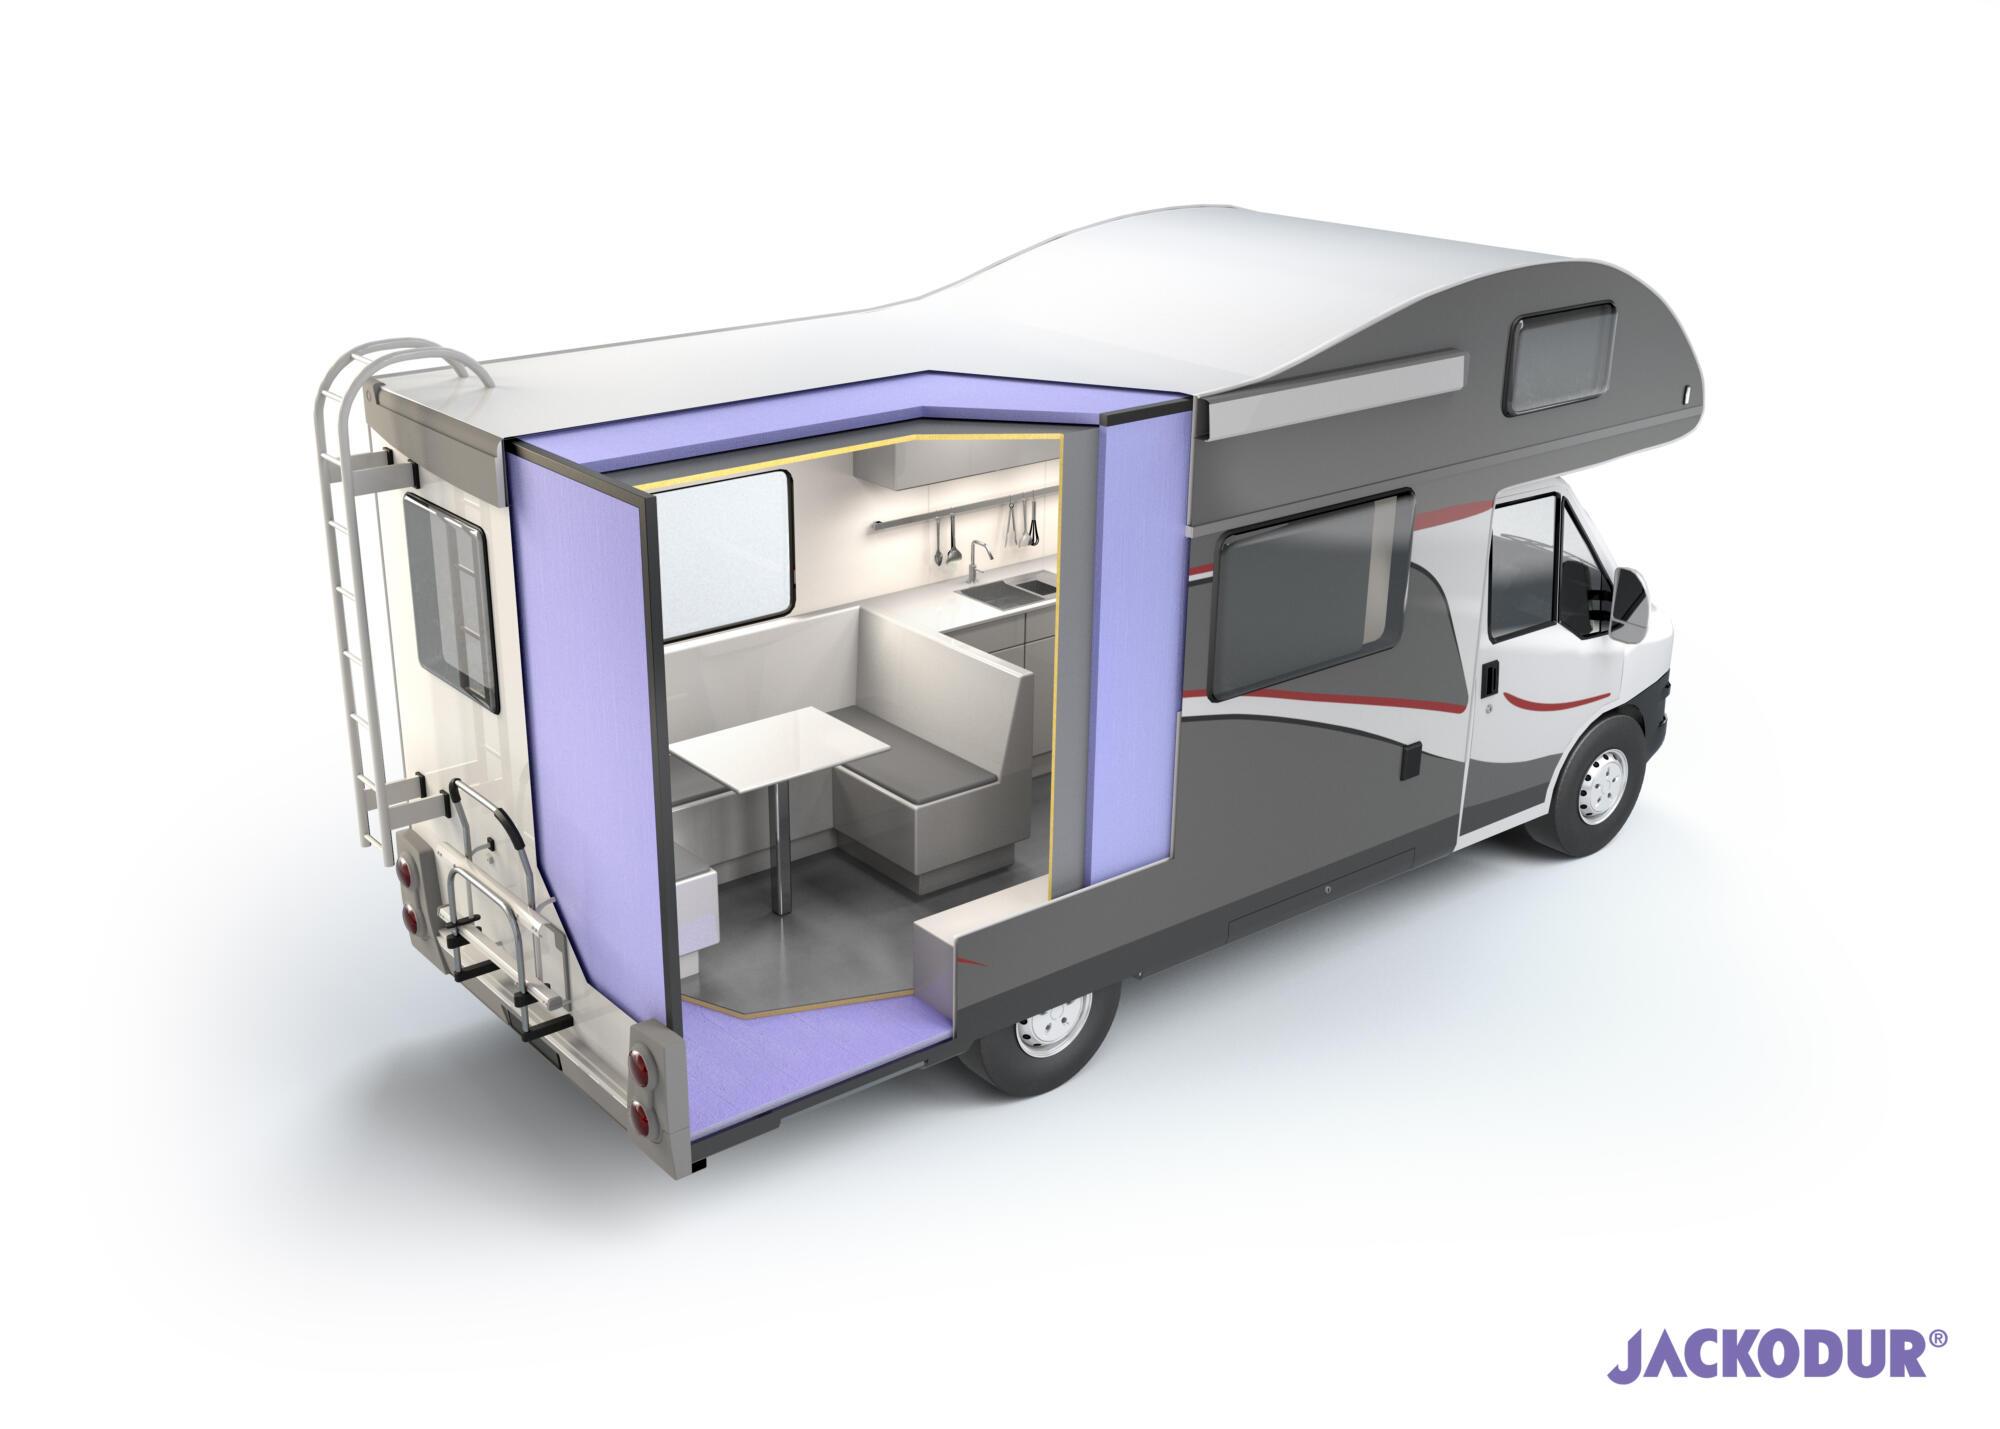 jackodur-industrie-caravan-logo